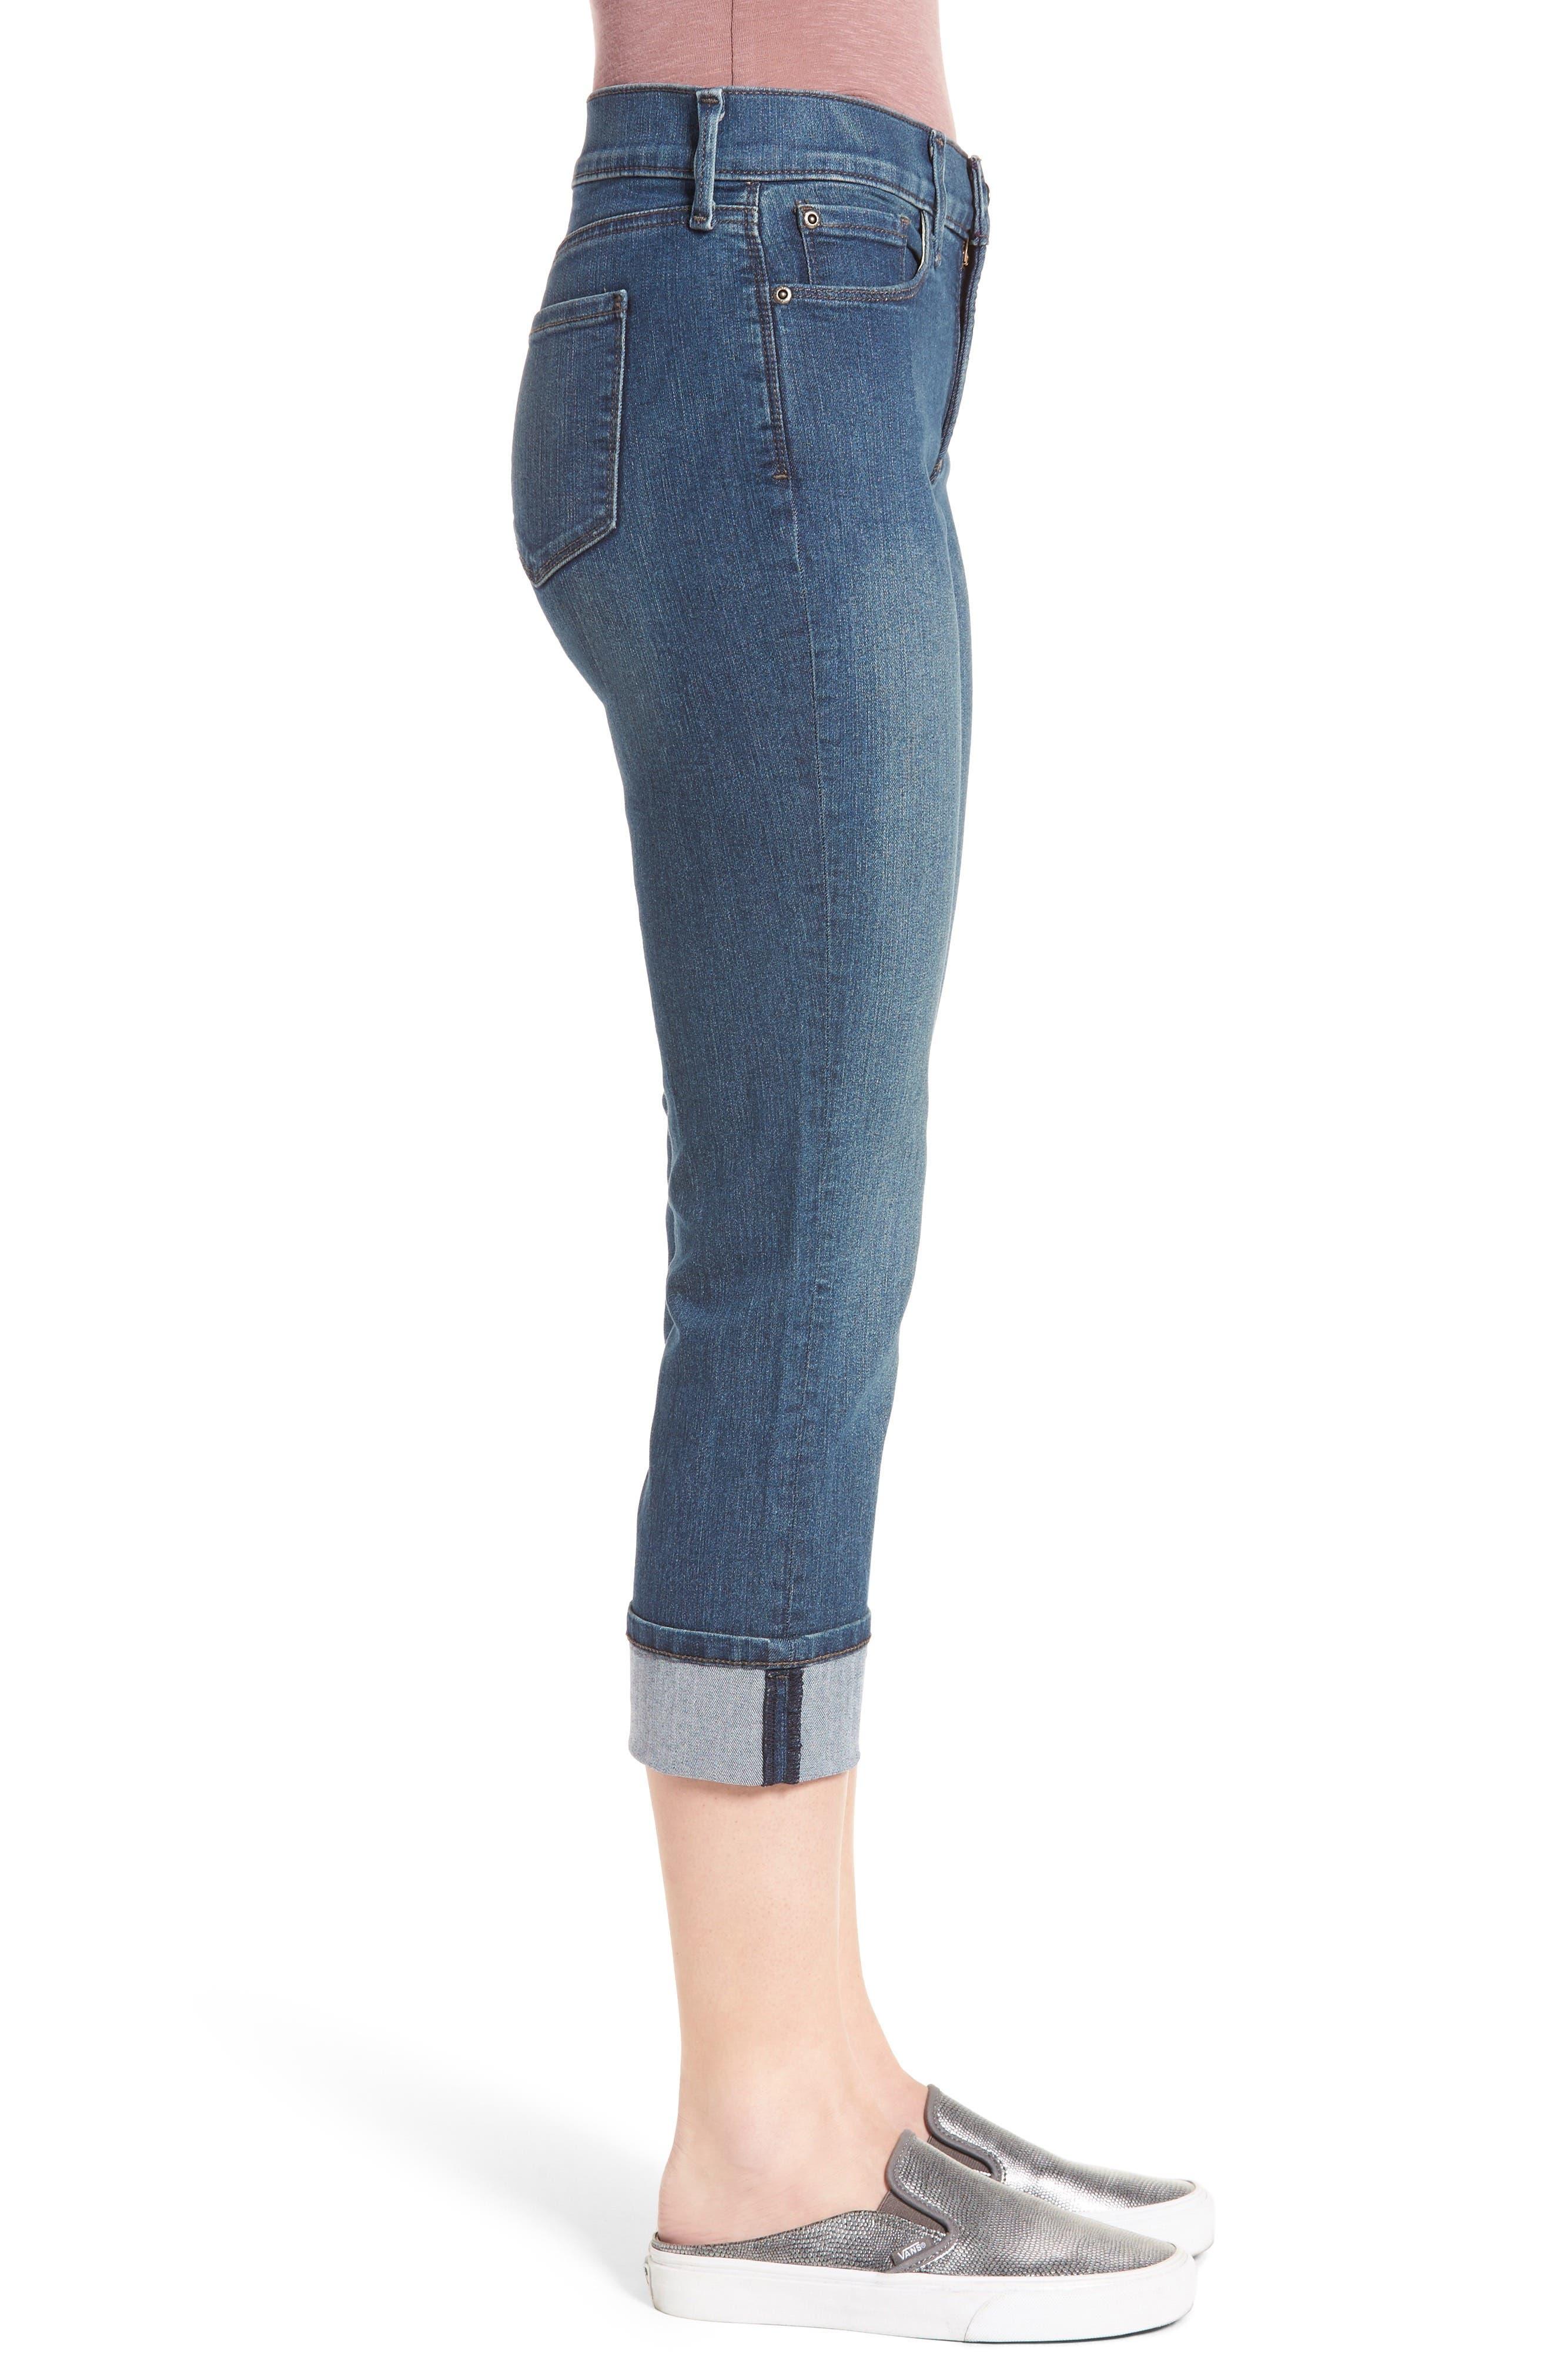 'Dayla' Colored Wide Cuff Capri Jeans,                             Alternate thumbnail 38, color,